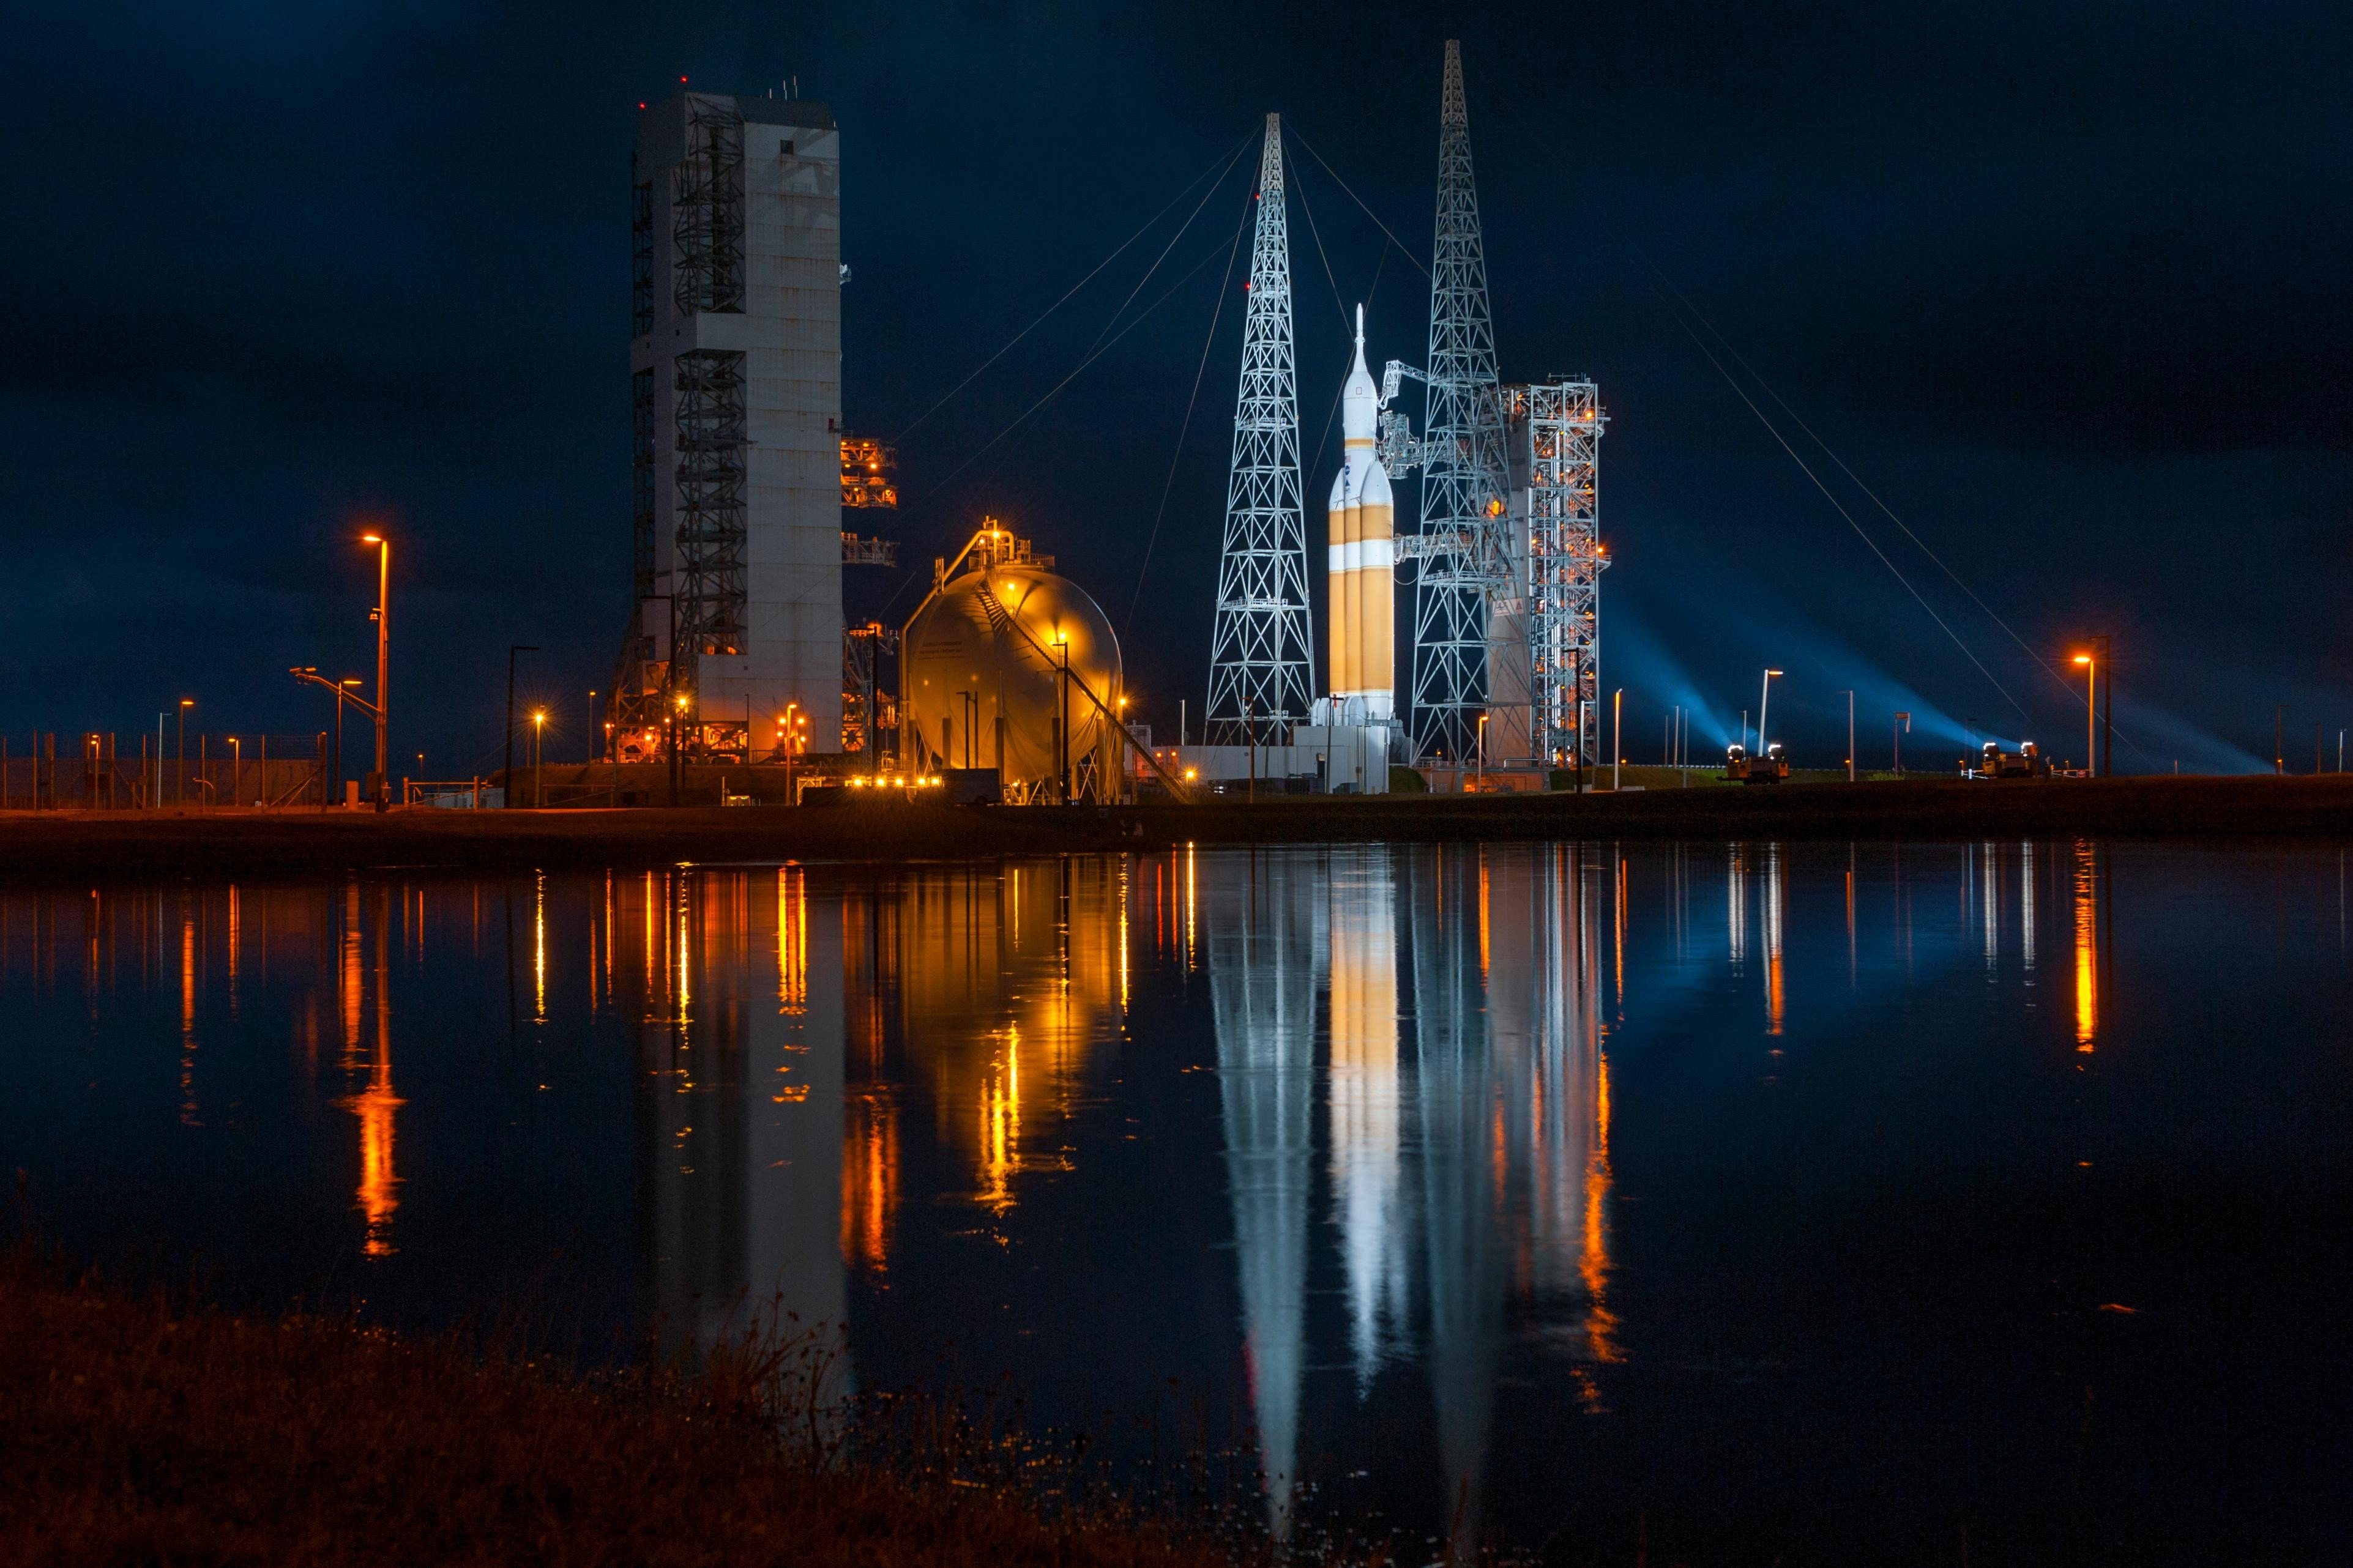 Rocket launch space lake water reflection nasa hd - Nasa space wallpaper hd ...